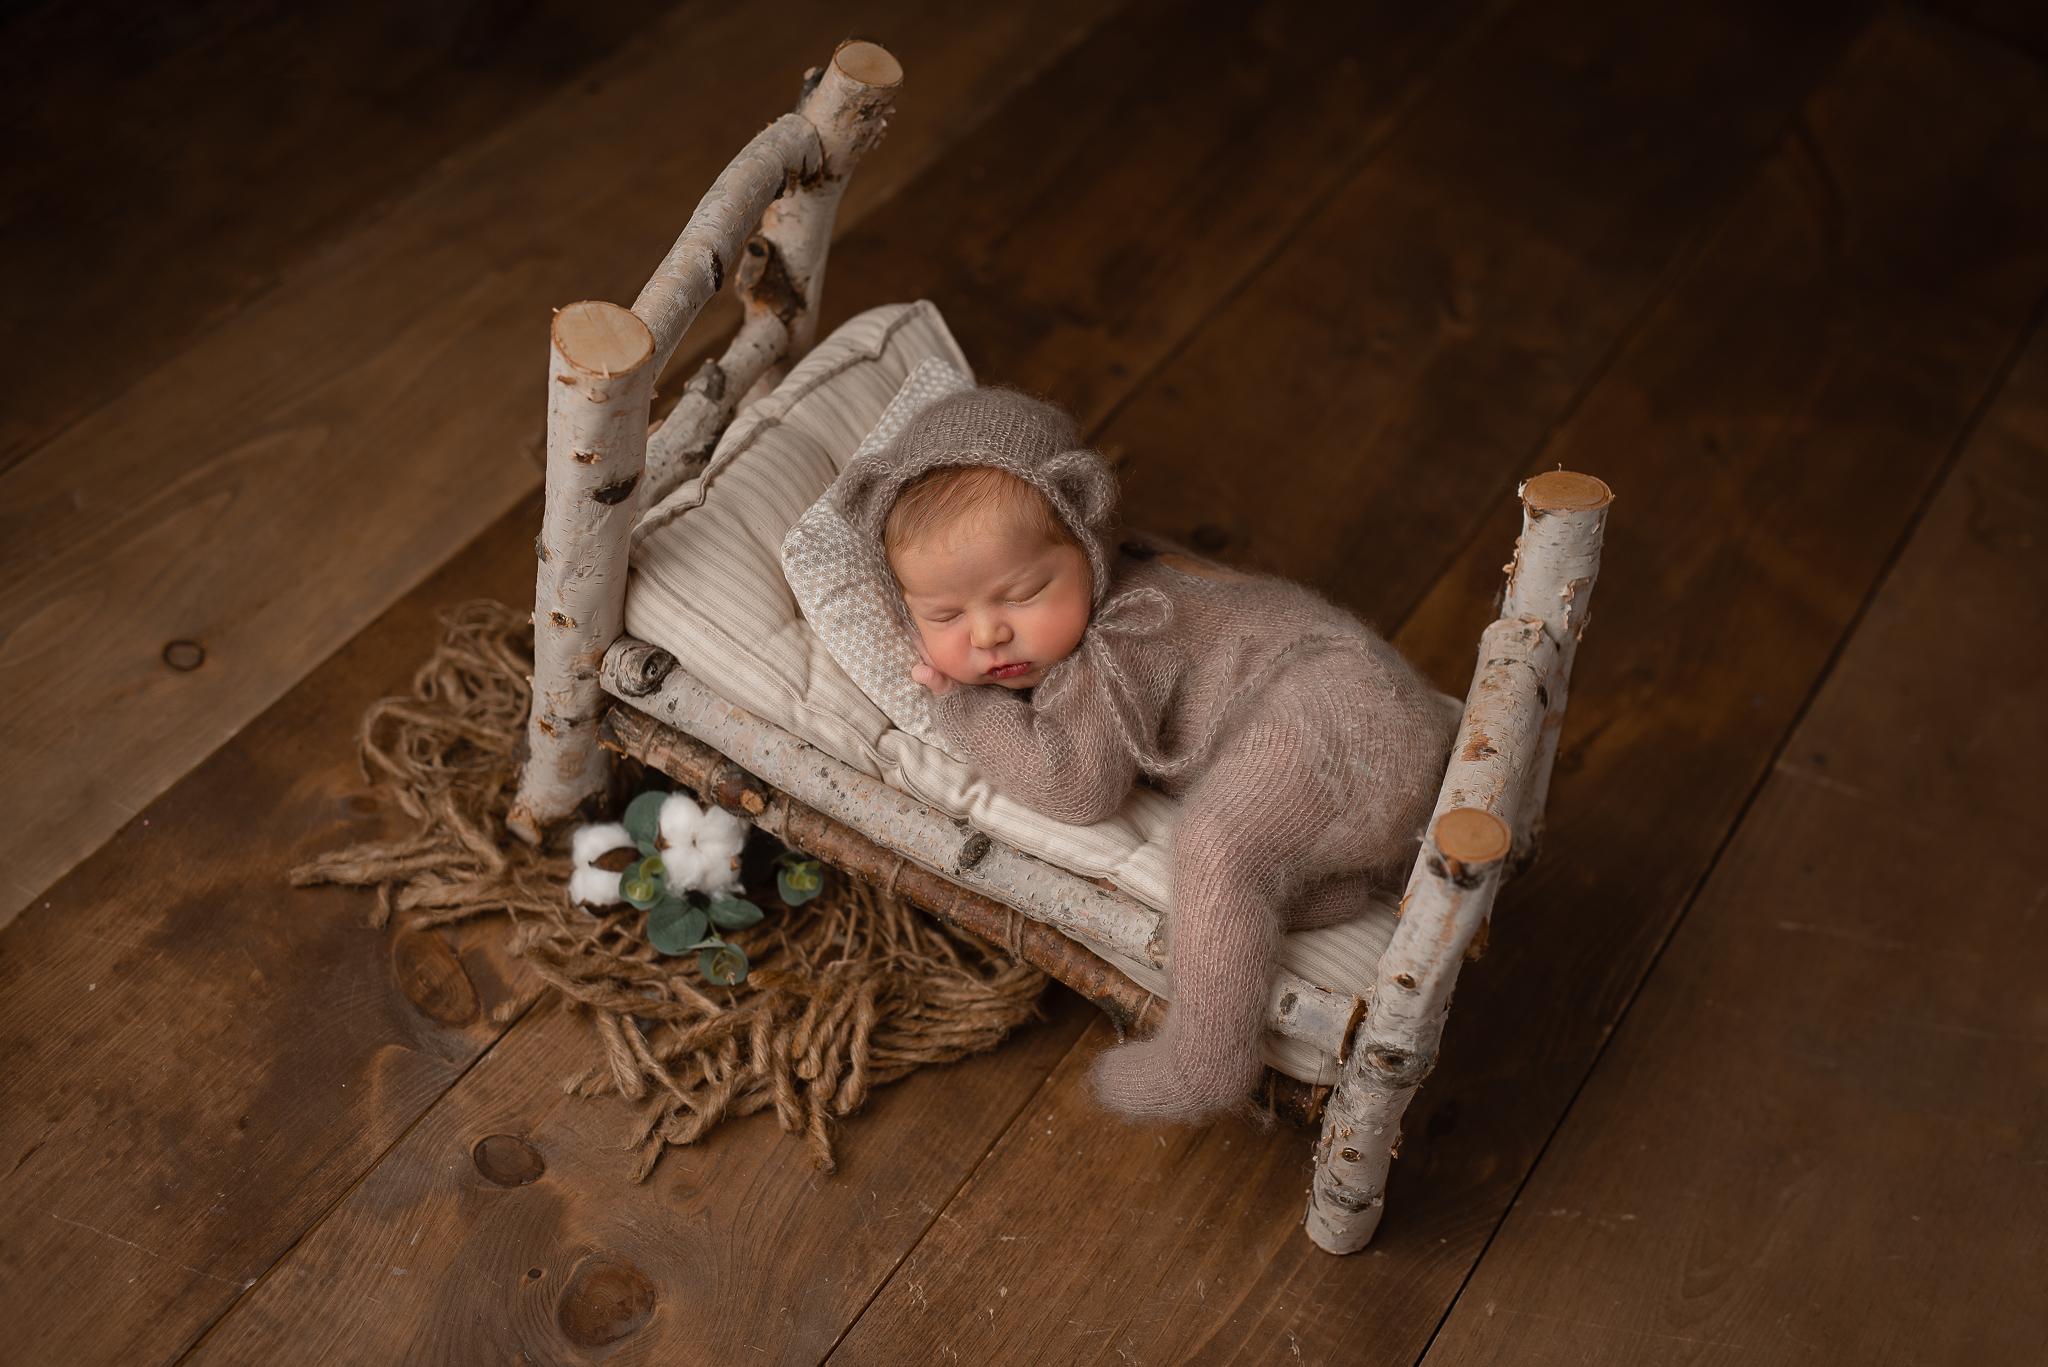 Newborn135NaomiLuciennePhotography062019-2-Edit-2.jpg